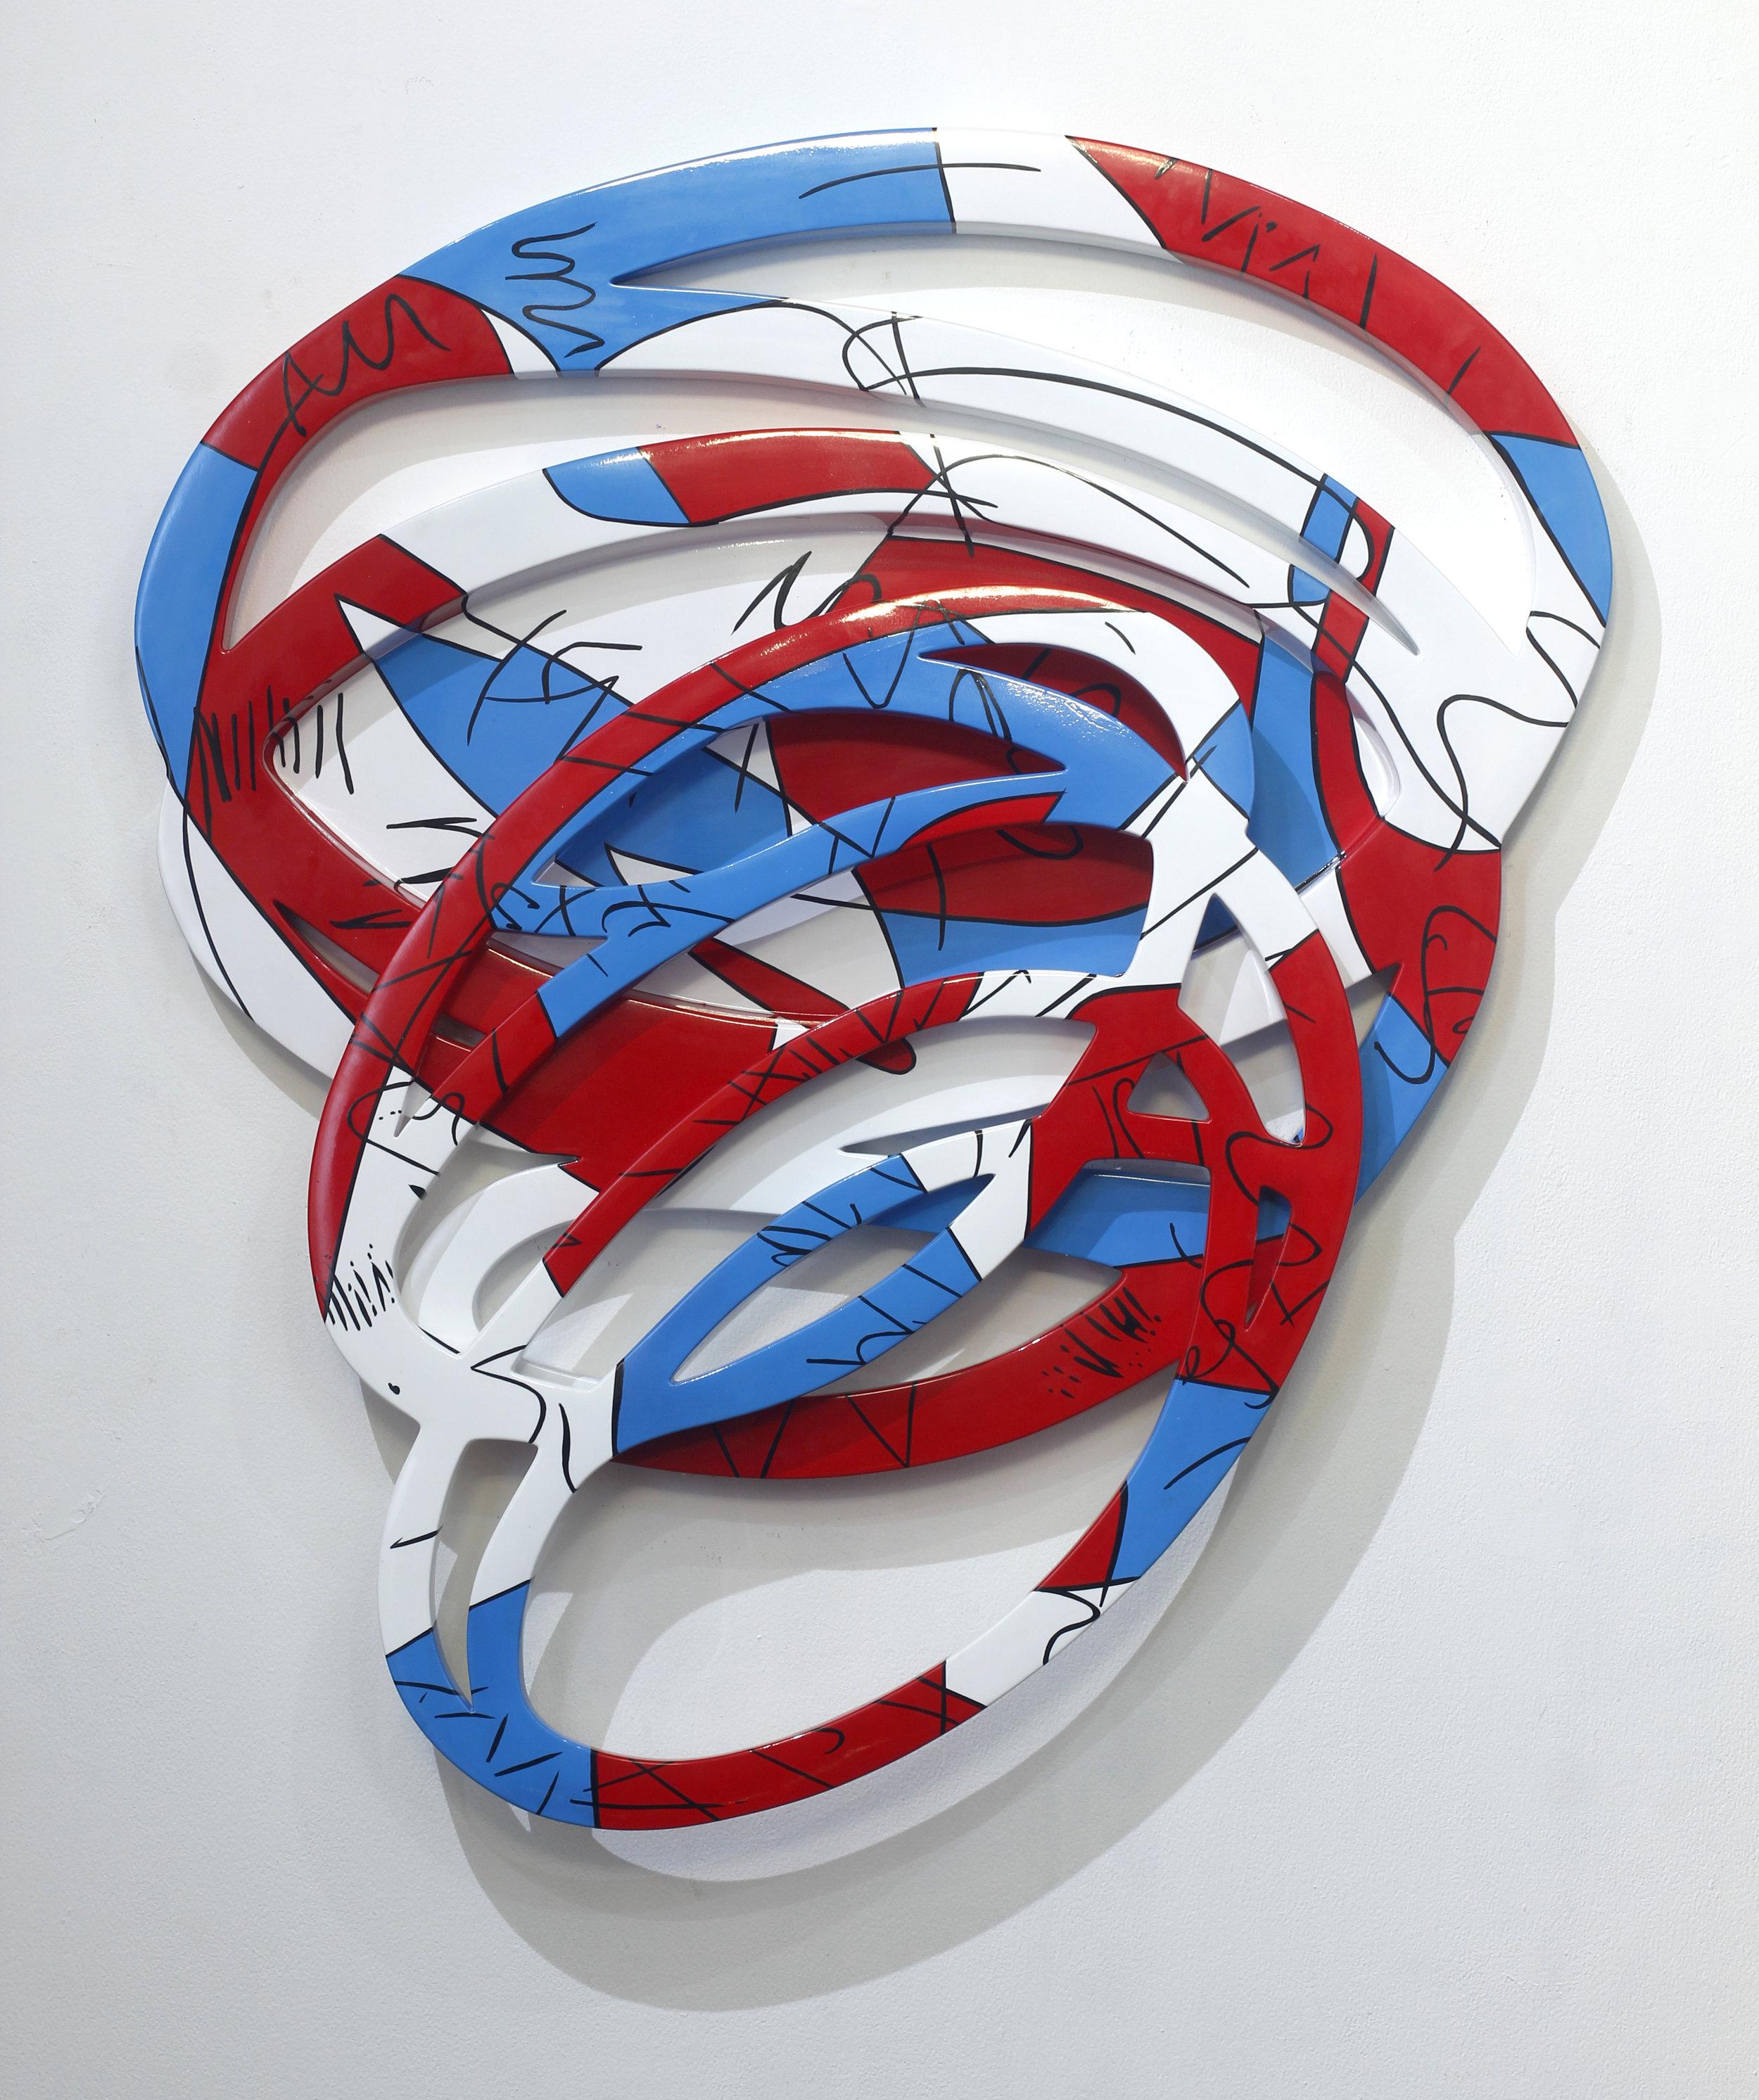 Artist: Erwin Windu Pranata, Indonesia  Title: The Stroke #9 Medium: polyurethane paint on steel sheet Dimension: 130 X 100 X 6 cm Year: 2019    SOLD